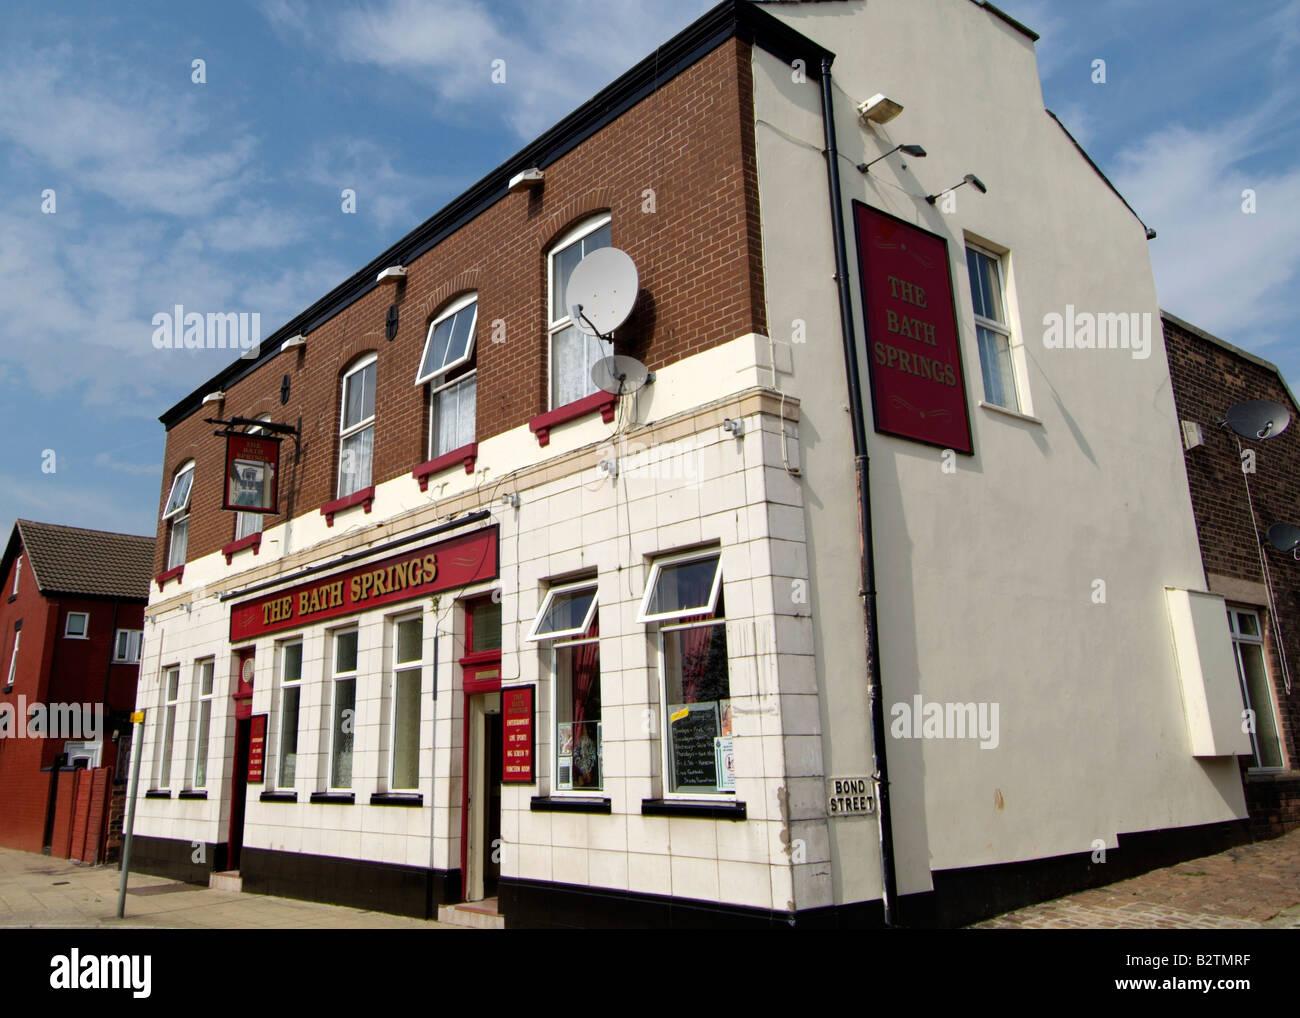 Bath Springs Pub, 103 Kemble Street, Prescot L34 5SG,UK - Stock Image